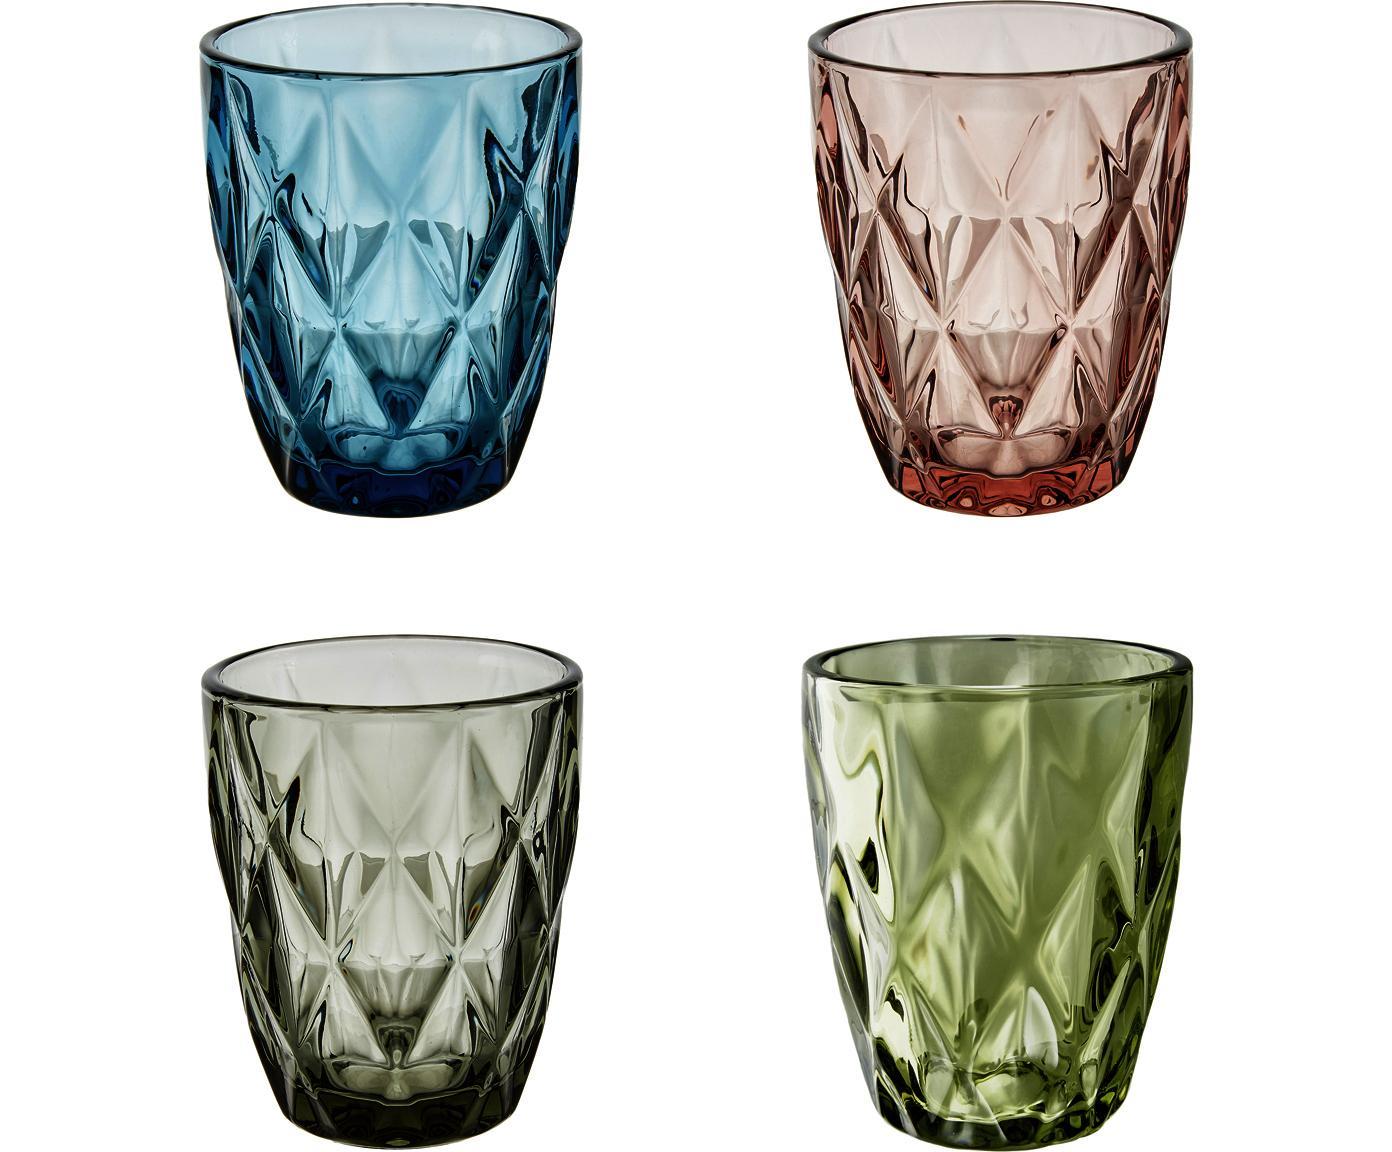 Wassergläser Colorado mit Strukturmuster, 4 Stück, Glas, Grün, Rosa, Blau, Grau, ∅ 8 x H 10 cm